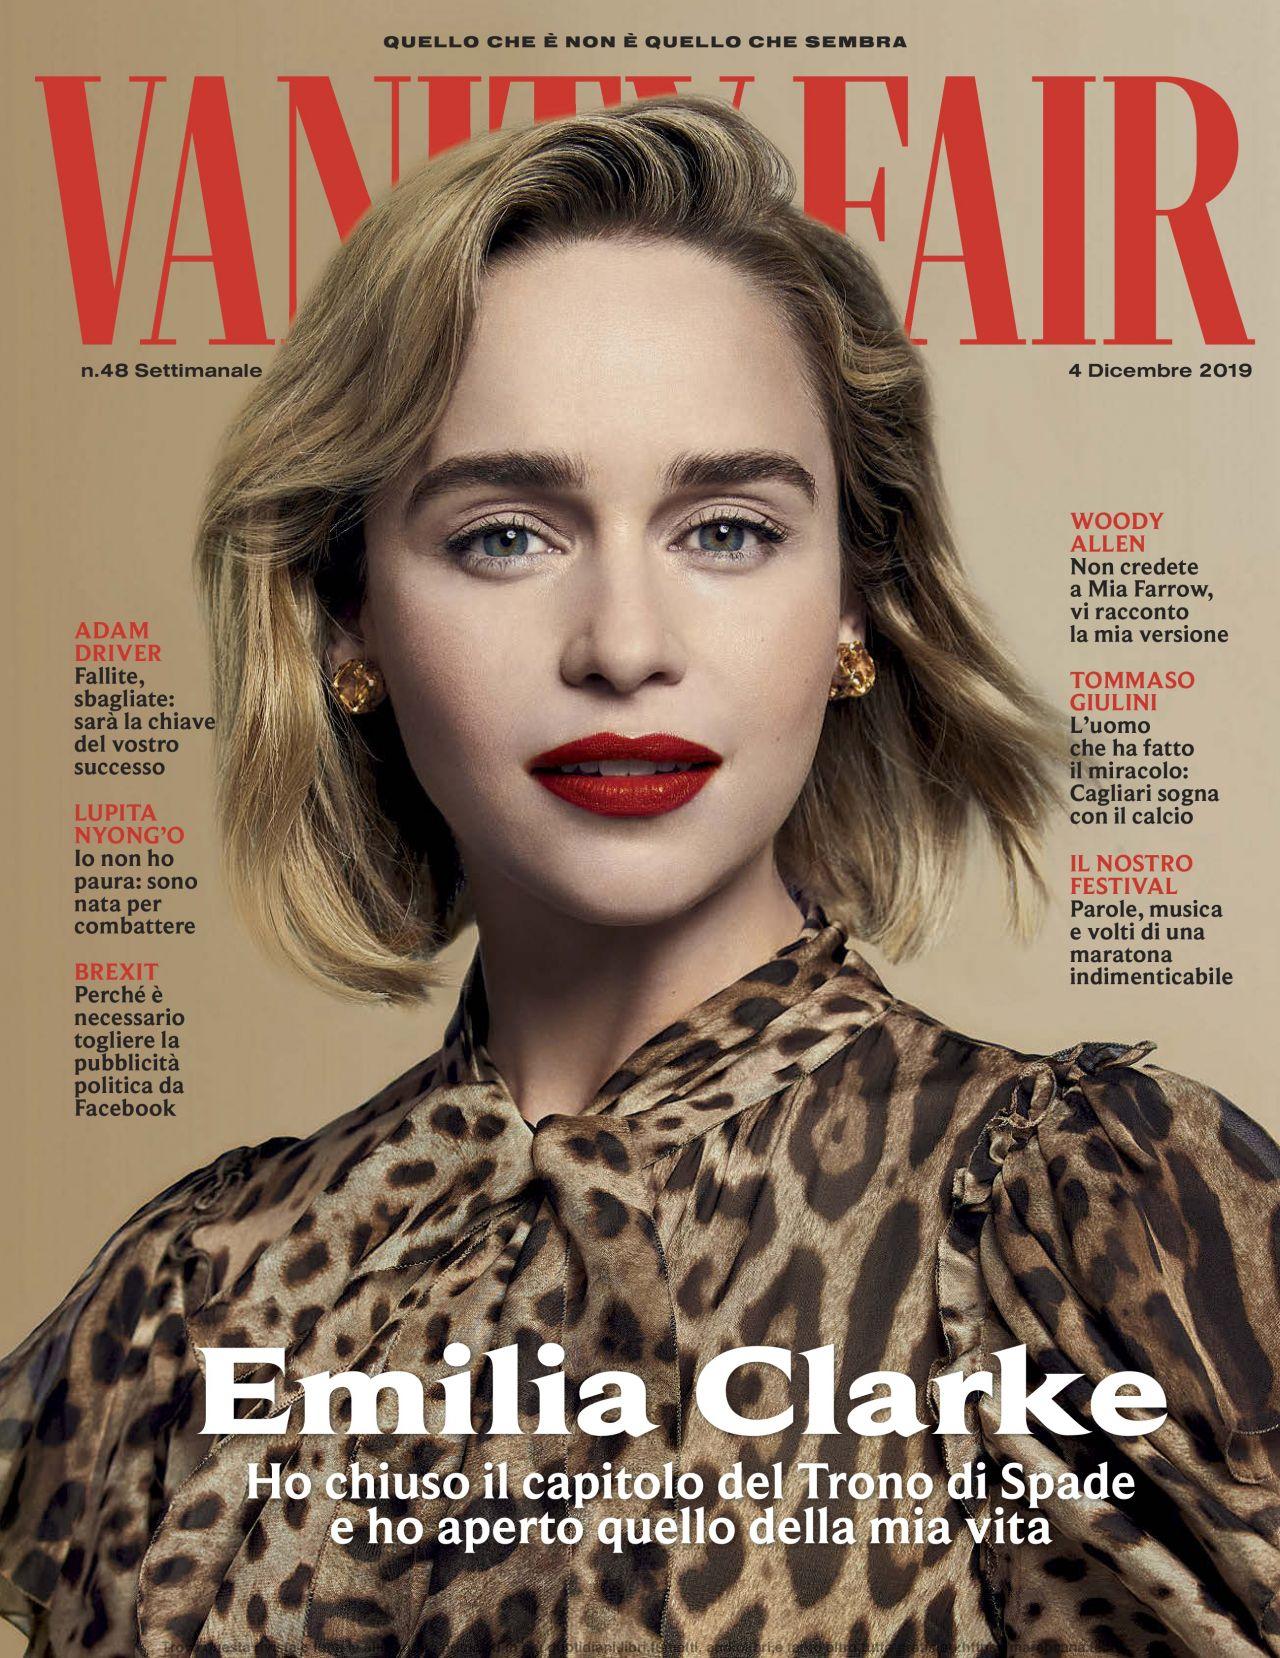 Vanity Fair Cover January 2020.Emilia Clarke Vanity Fair Italy 12 04 2019 Issue